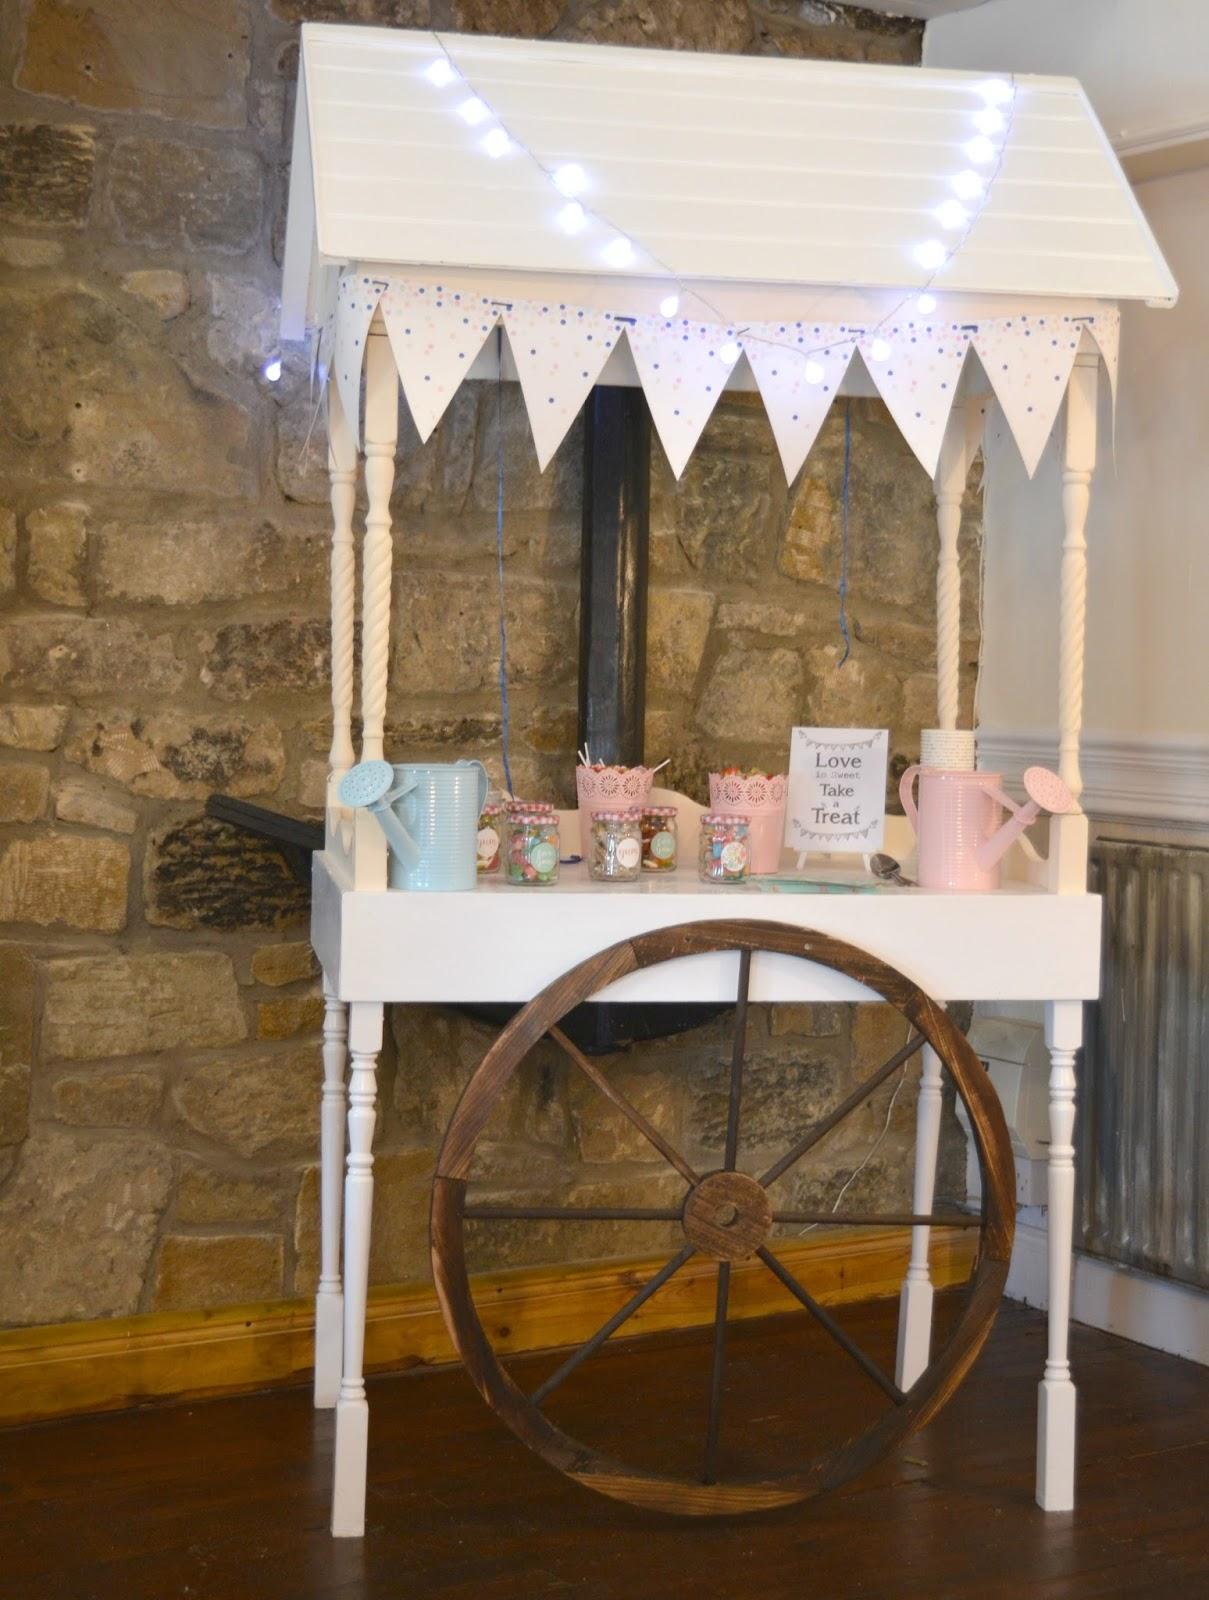 Weddings at Webster's Ropery, Sunderland: A North East Wedding Venue Sweet Cart